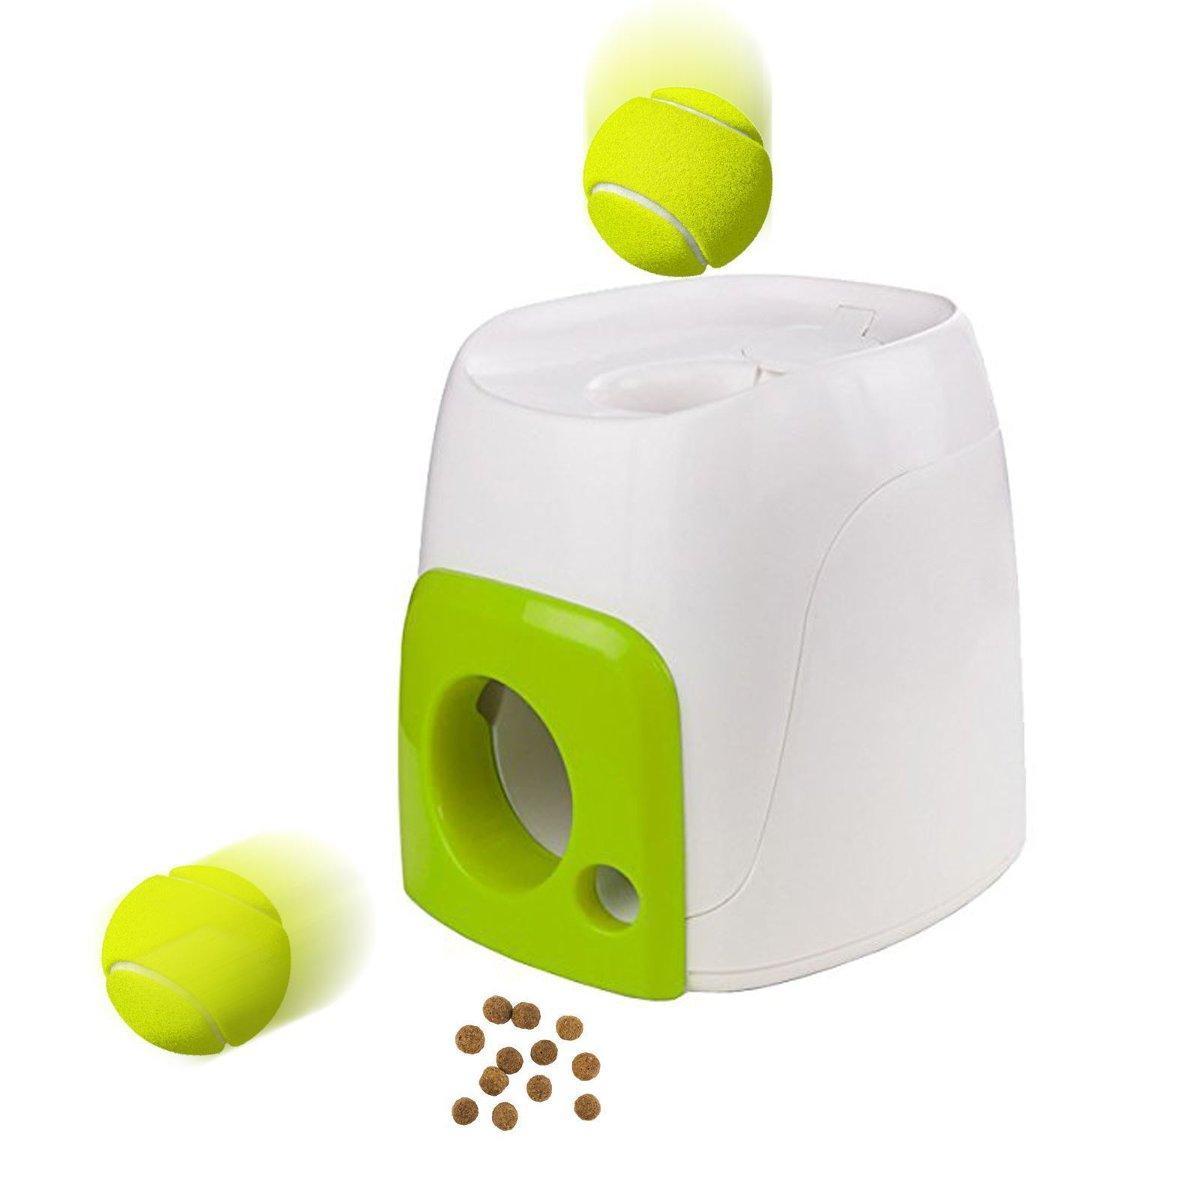 2019 Dog Toy Reward Machine Trainning Tennis Baseball Interactive